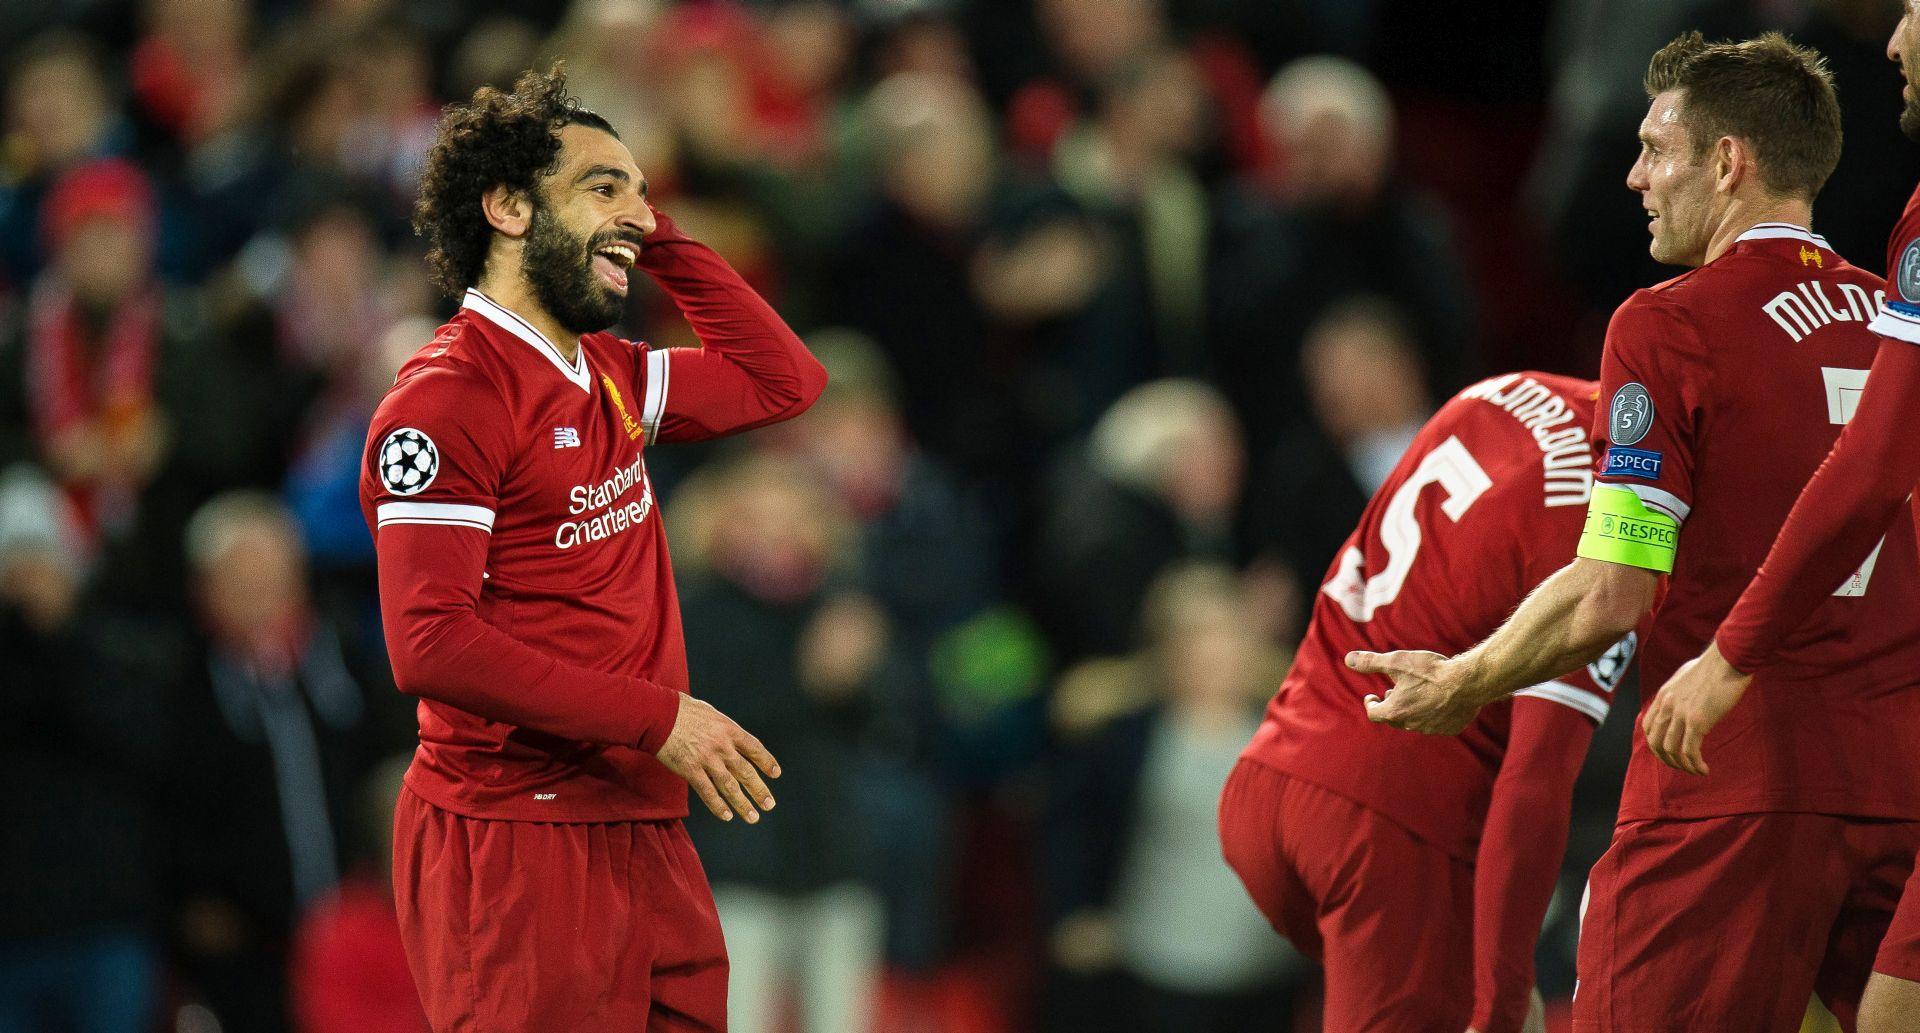 PREMIERLIGA 'Petarda' Chelsea, Salah donio preokret Liverpoolu